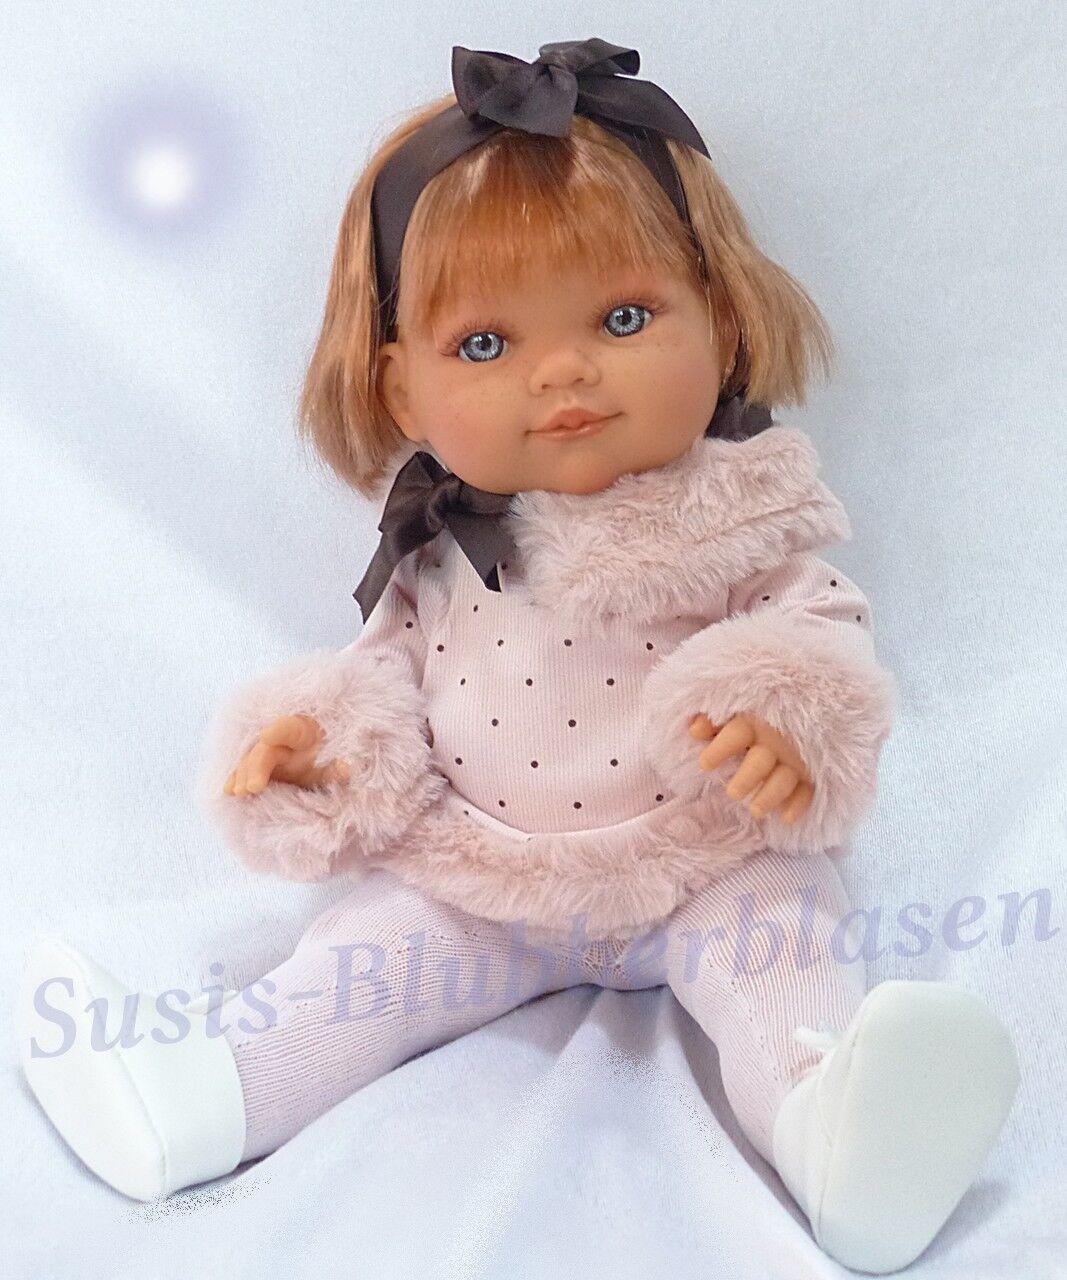 Antonio Juan Spielpuppe  Farita Lazo   38cm - Bezauberde Puppe mit Kunsthaar